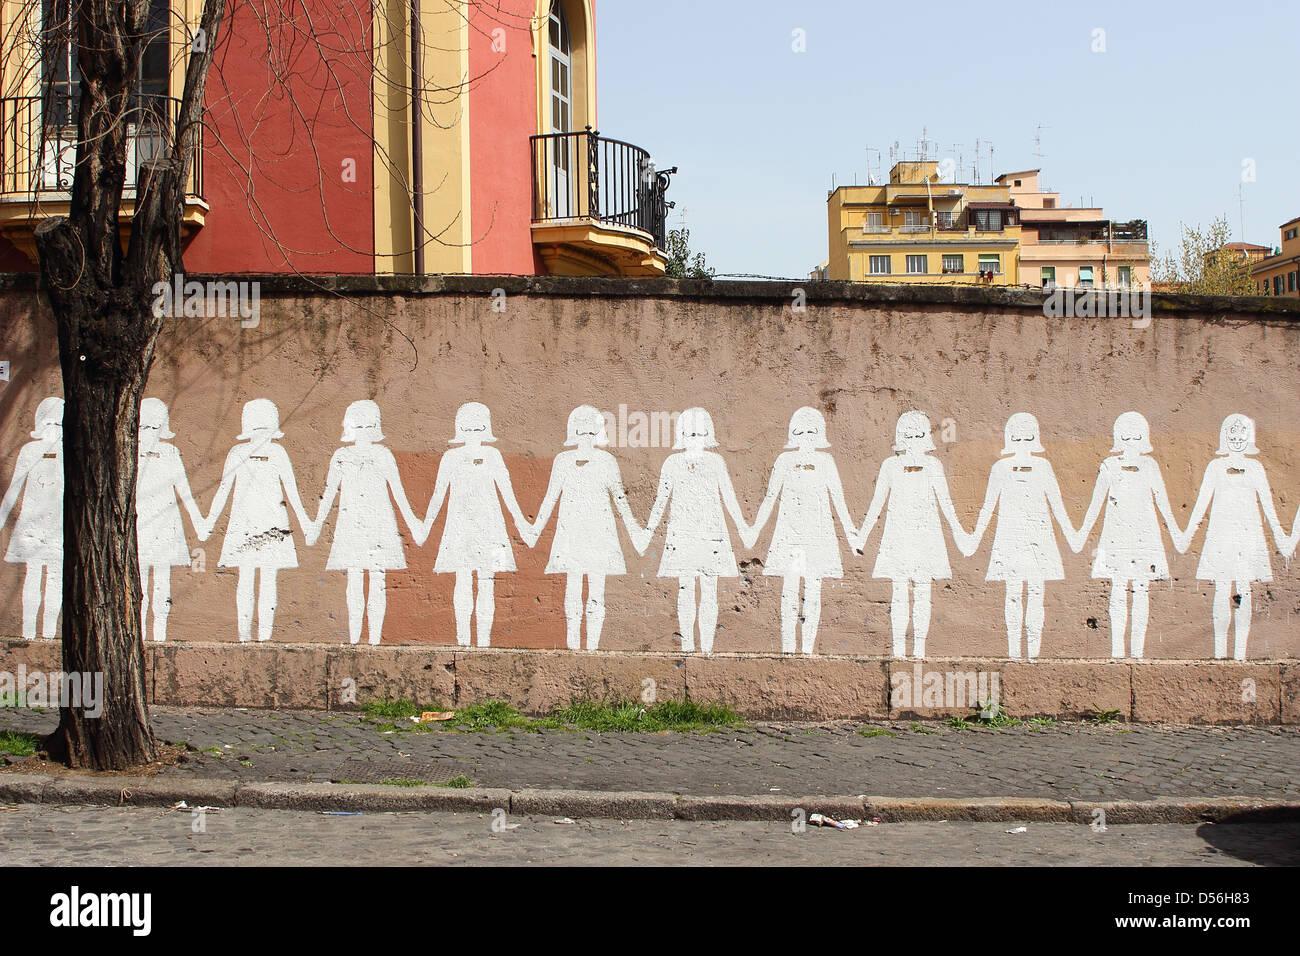 Paper doll graffiti in a public street - Rome - Stock Image